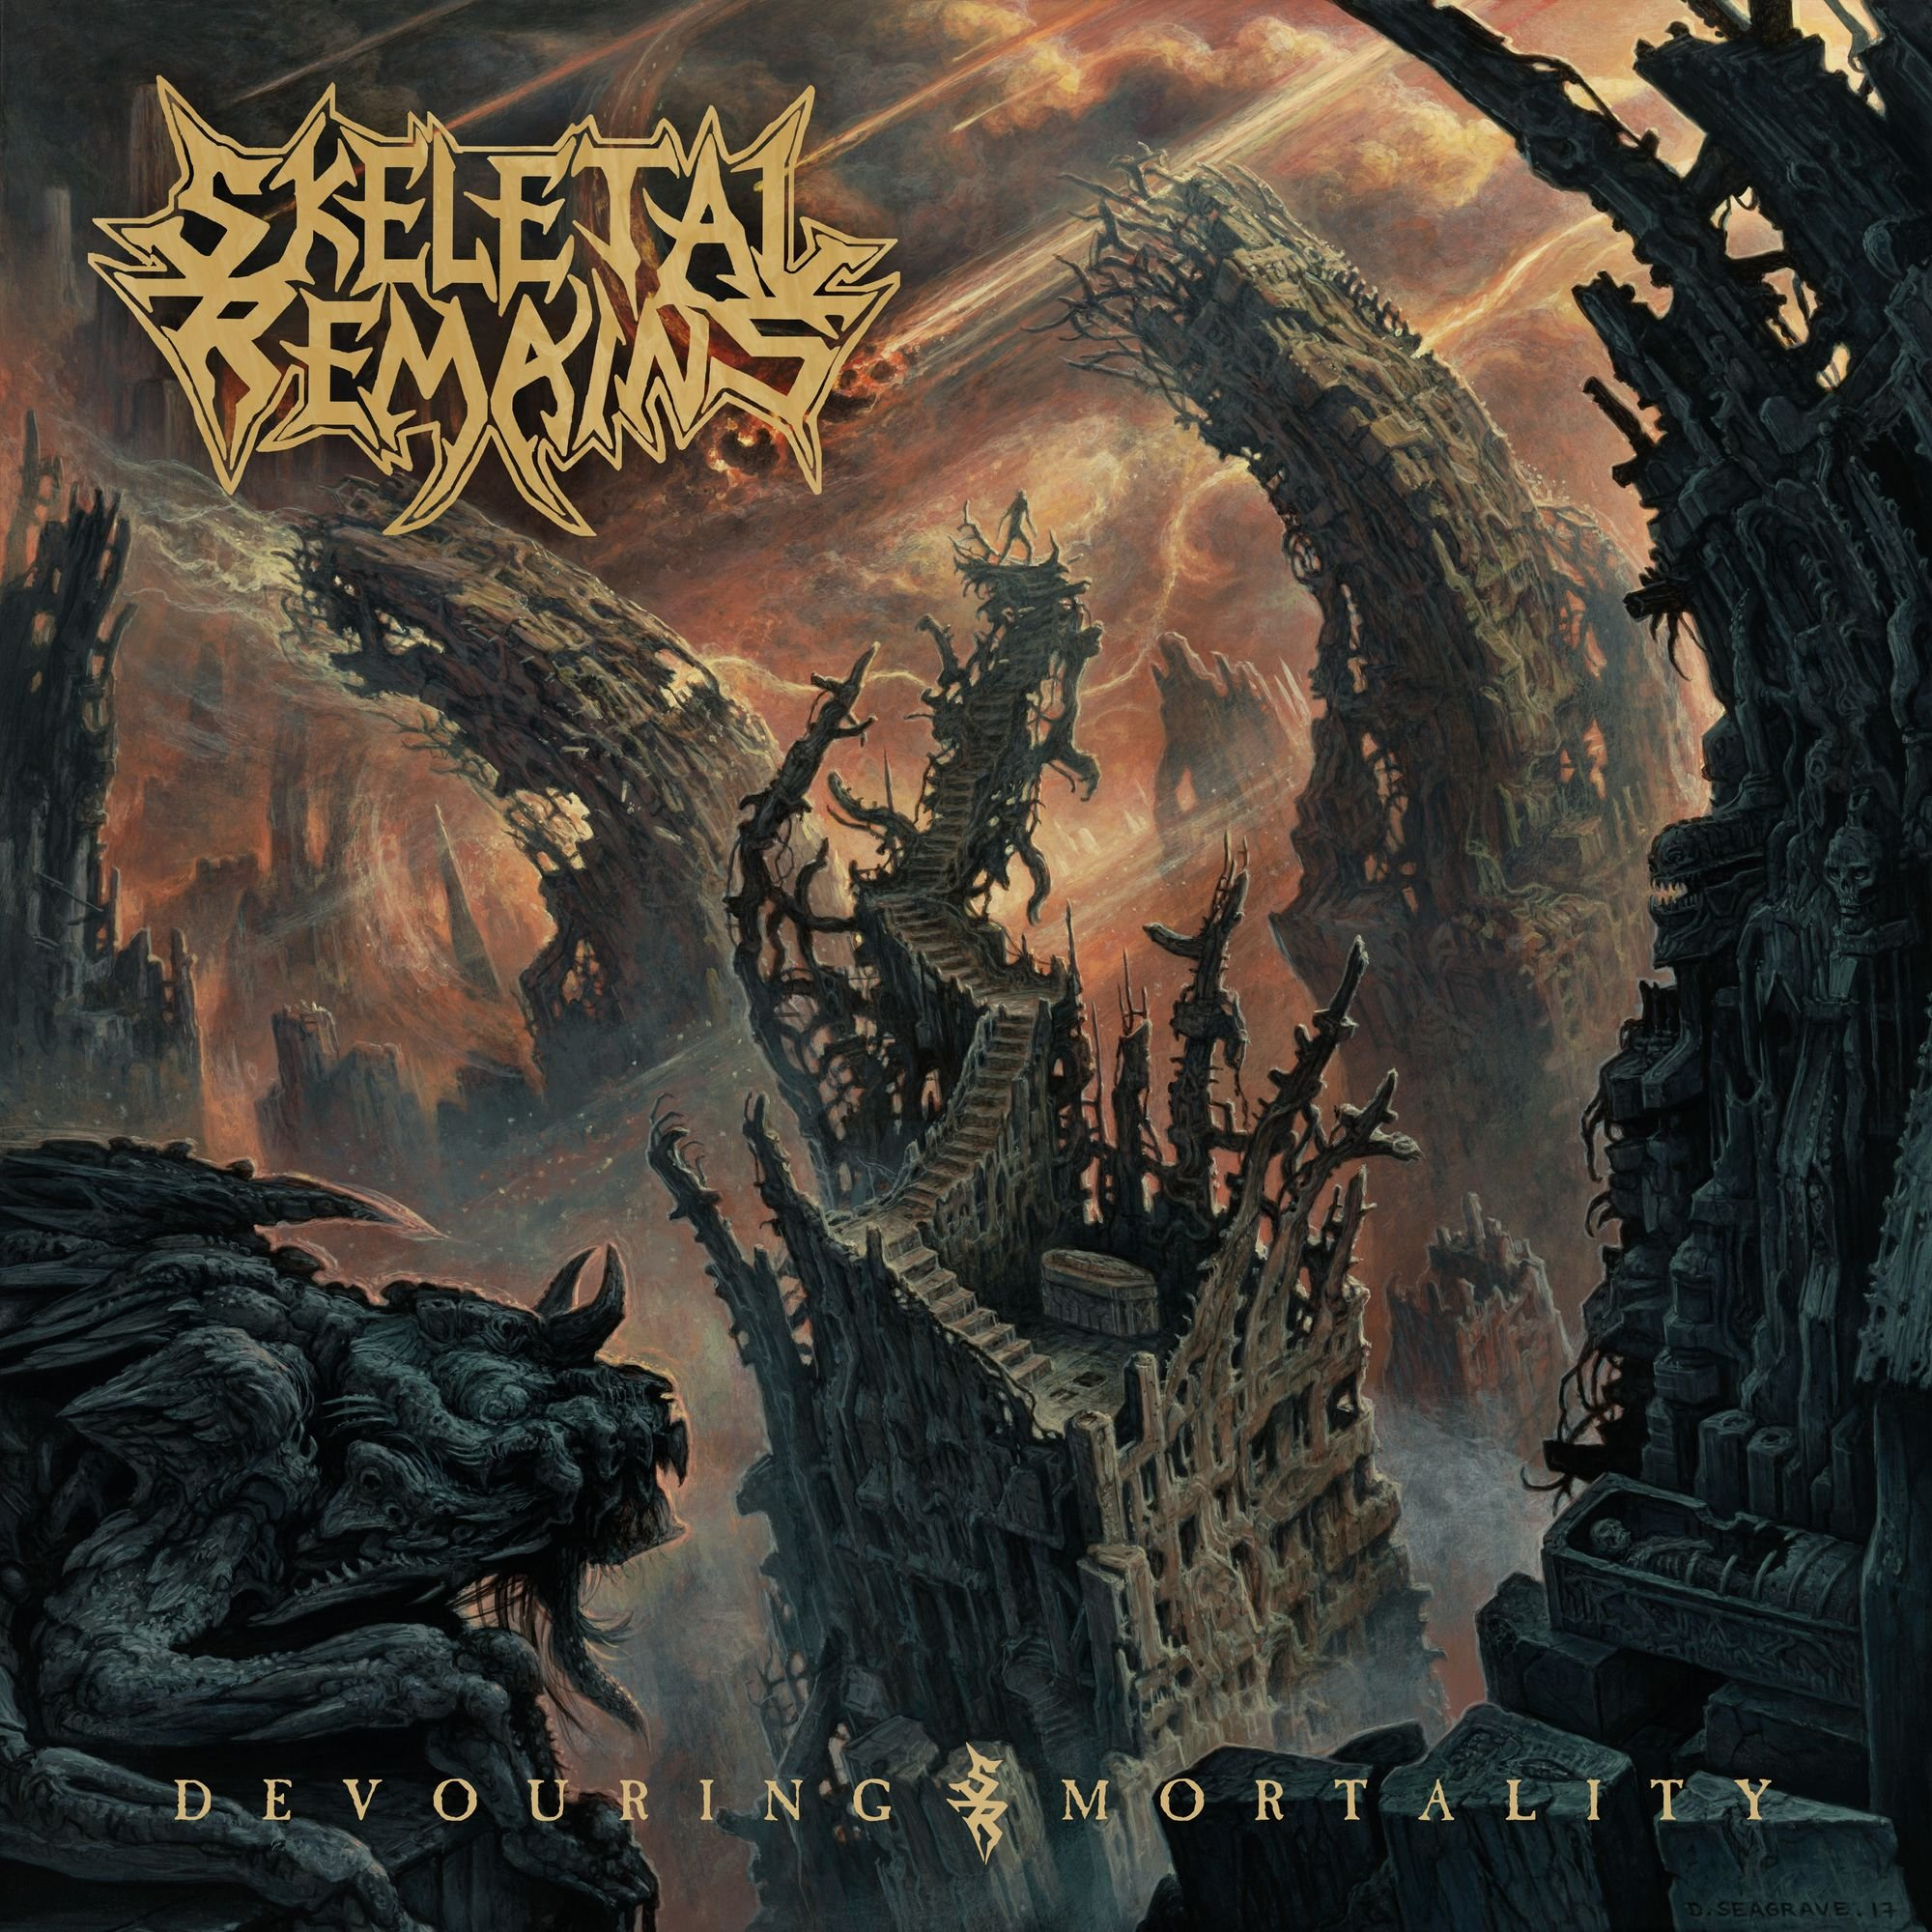 CD : Skeletal Remains - Devouring Mortality (CD)